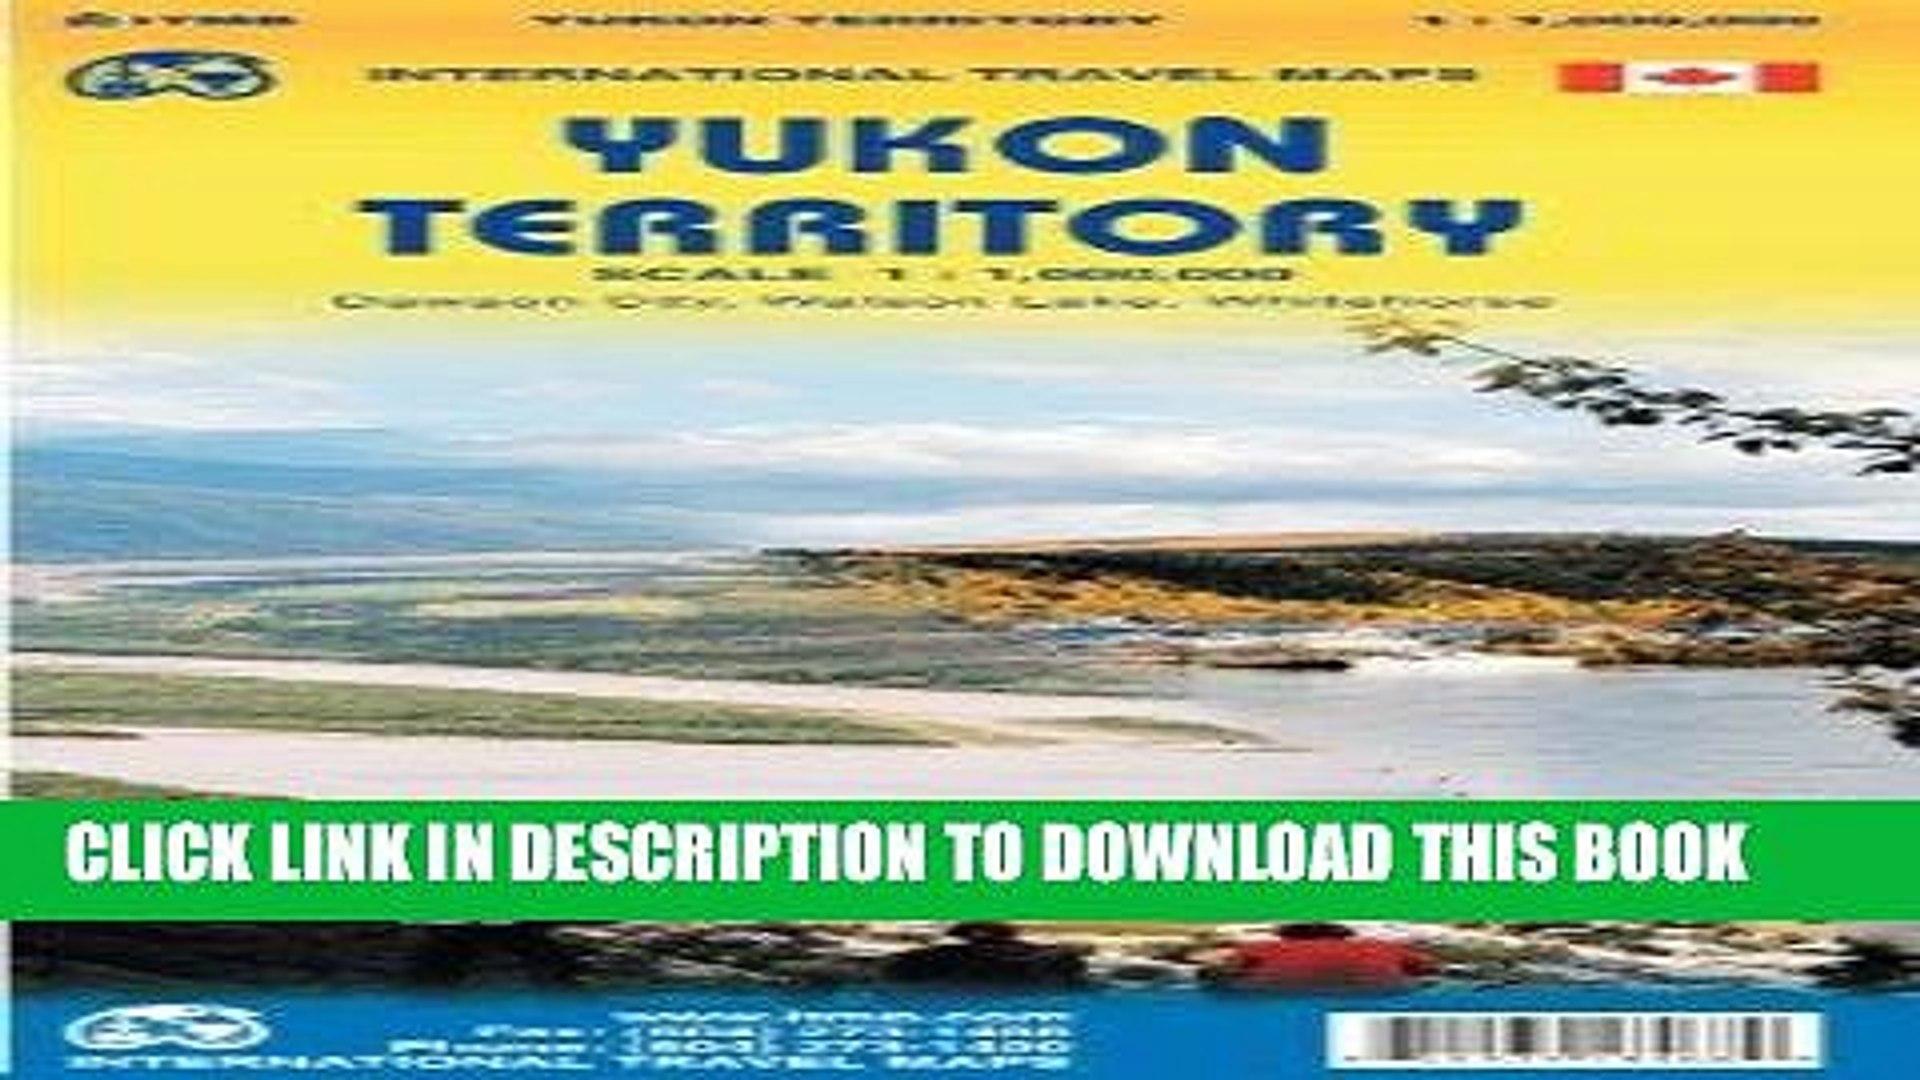 [Free Read] Yukon Territory 1: 1 000 000 inclue: Dawson, Watson Lake and Whitehorse inset